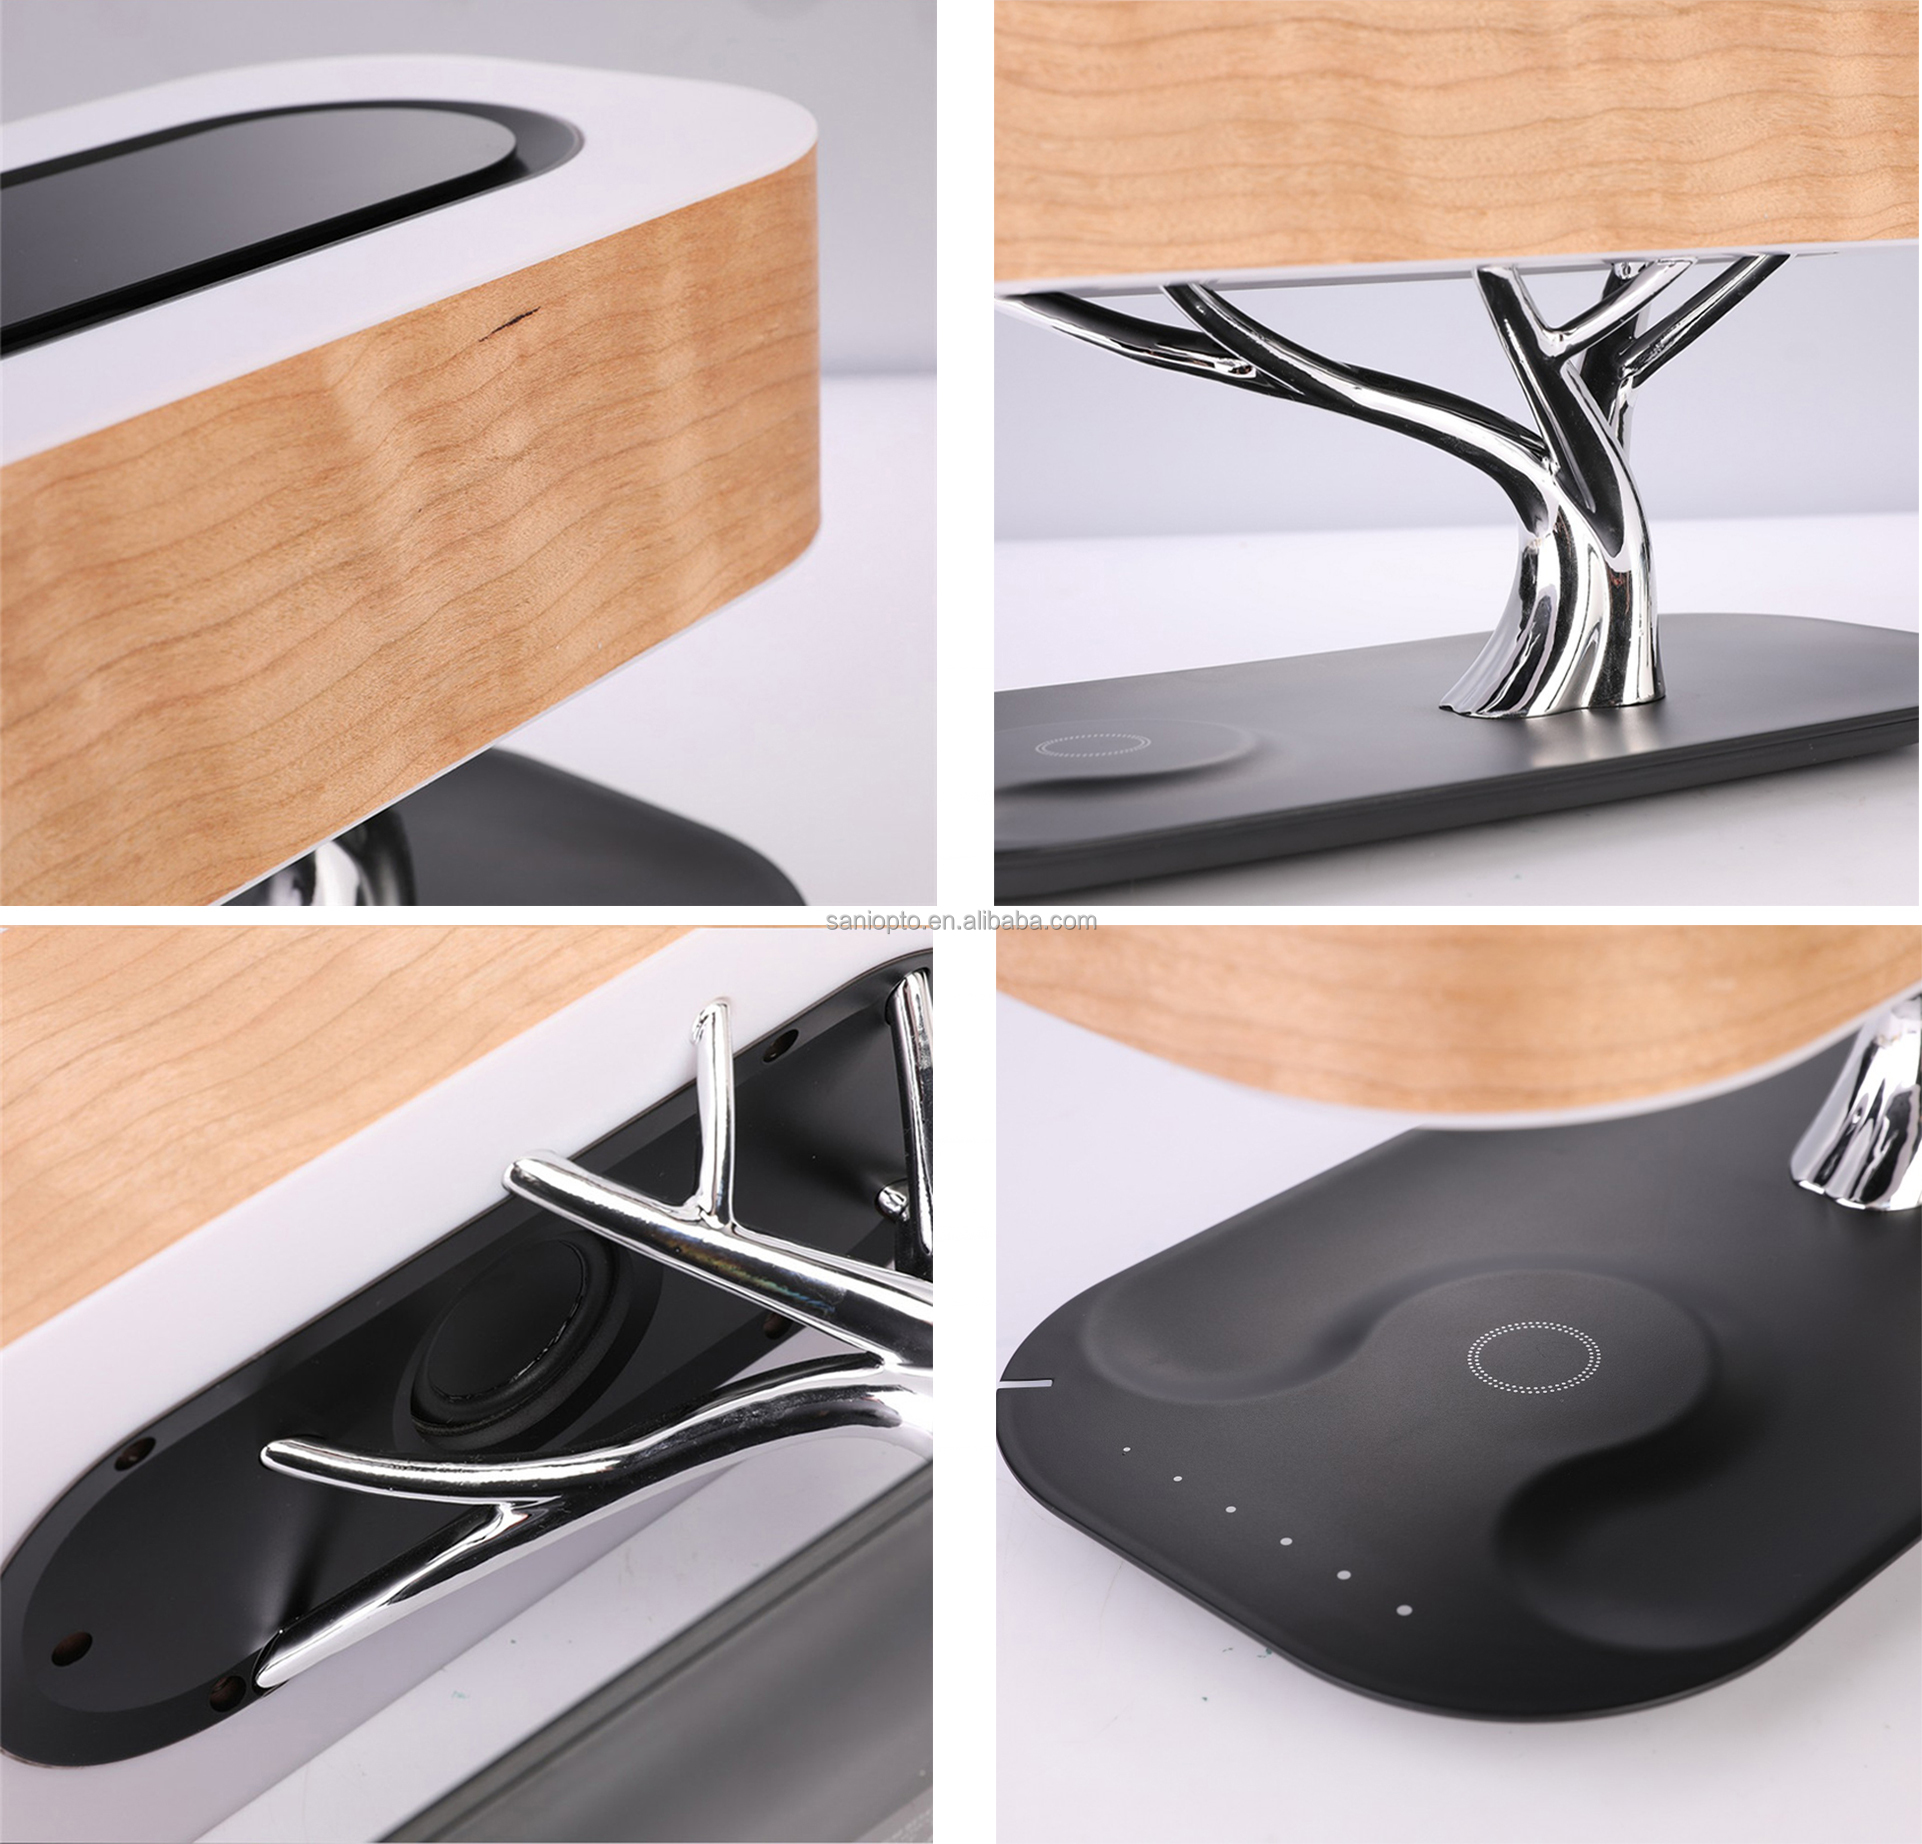 2021 latest gadget new technology LED bedside lamp bt speaker desk lamp Sleep Mode Stepless Dimming (Exclusive)